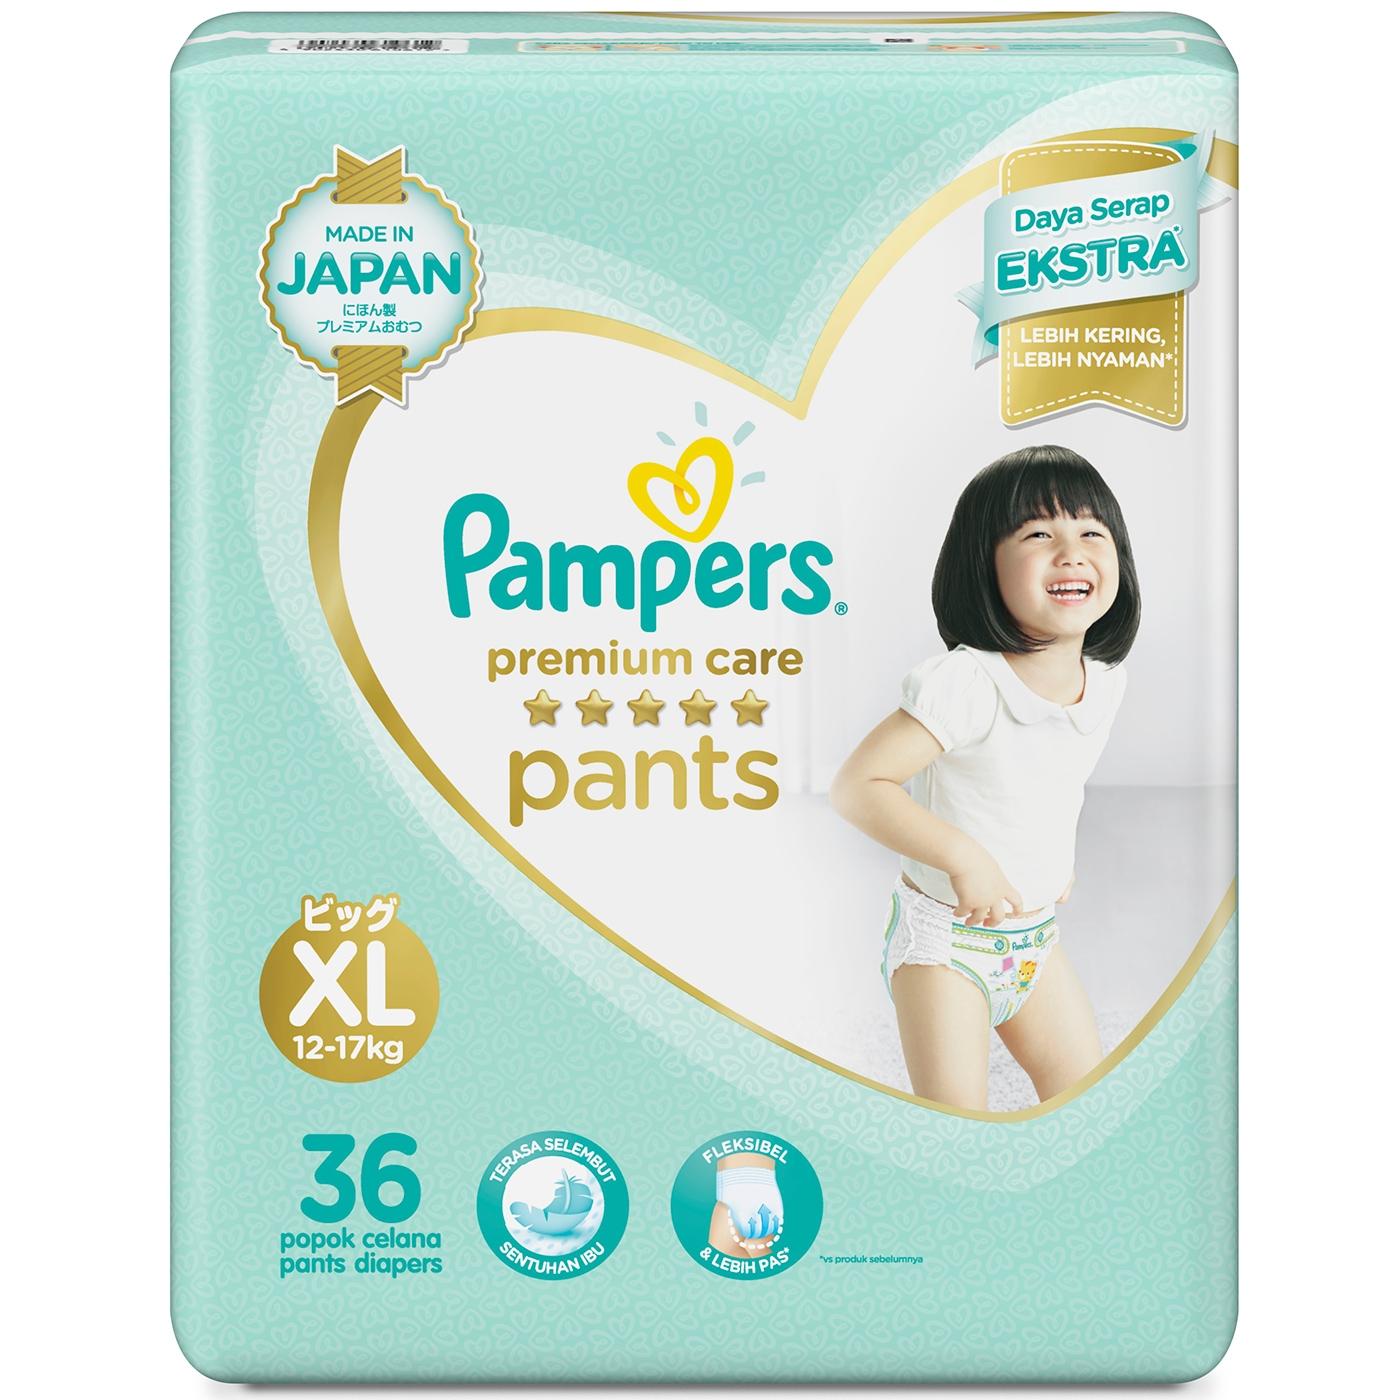 Pampers Popok Celana XL-36 Premium Care 1